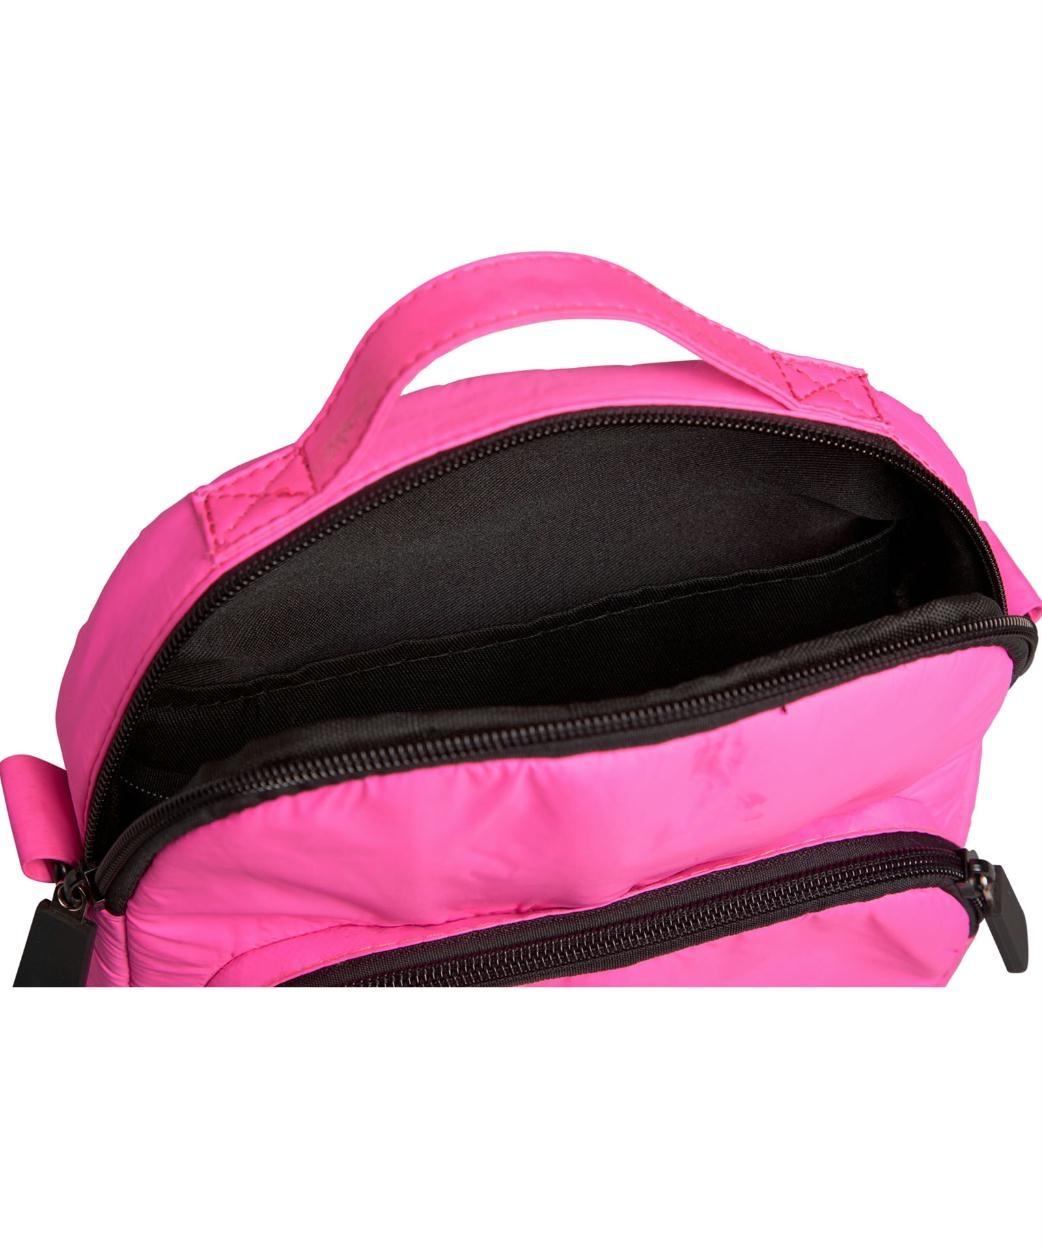 10Days Fluor Pink Utility Bag 20.955.9103/8